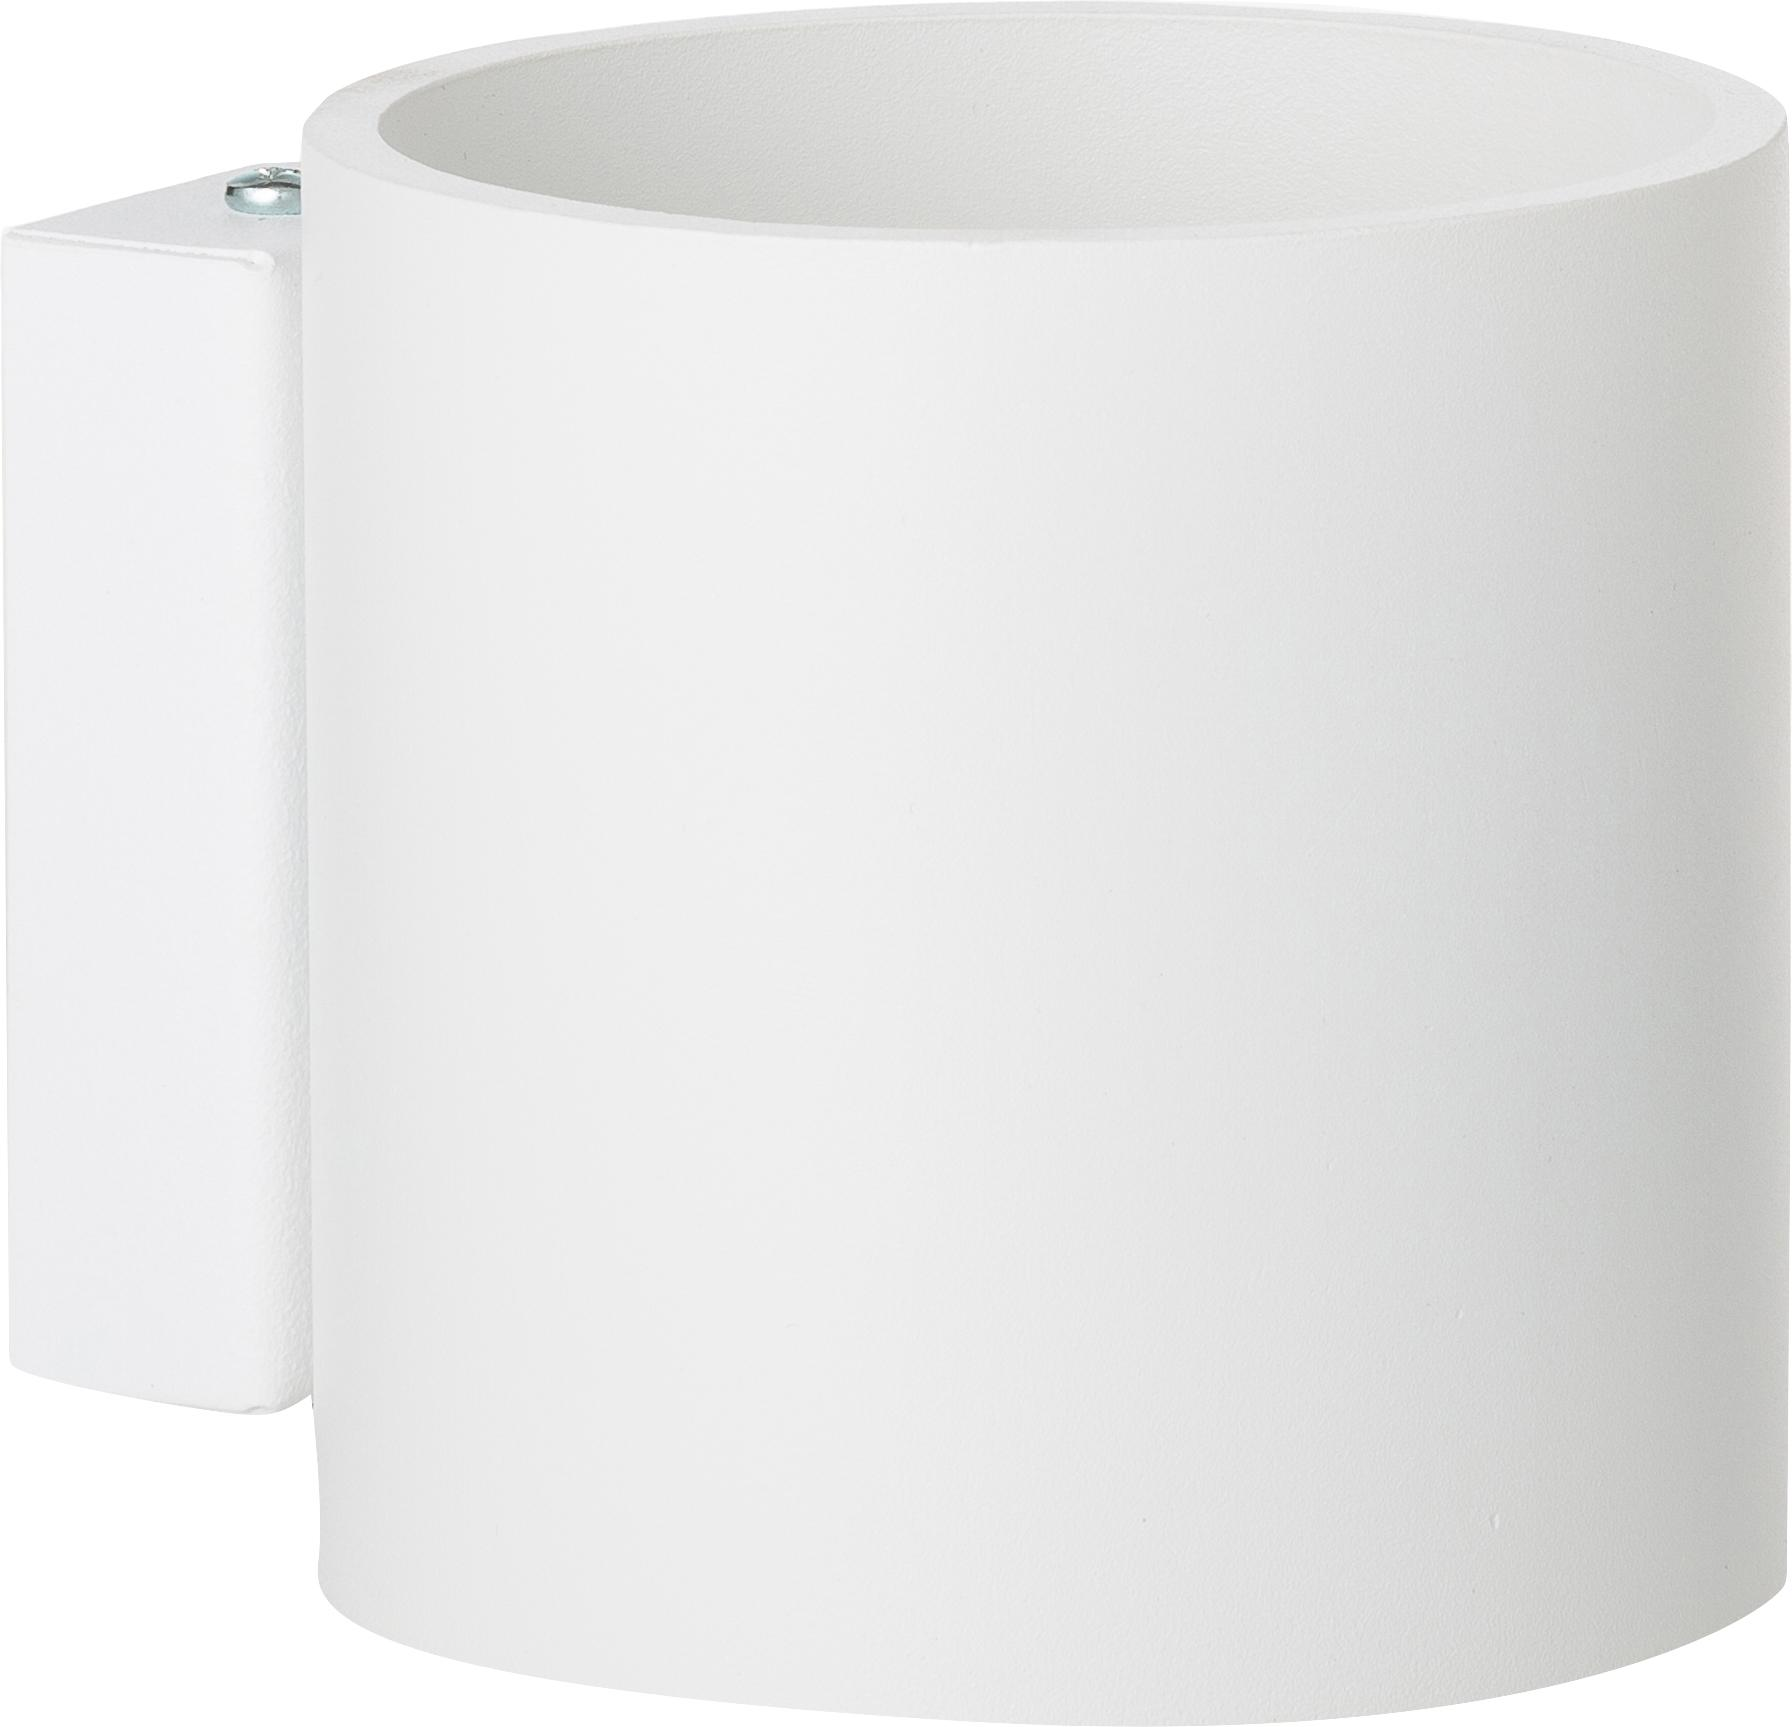 ApliqueValencia, Aluminio con pintura en polvo, Blanco, An 10 x Al 10 cm